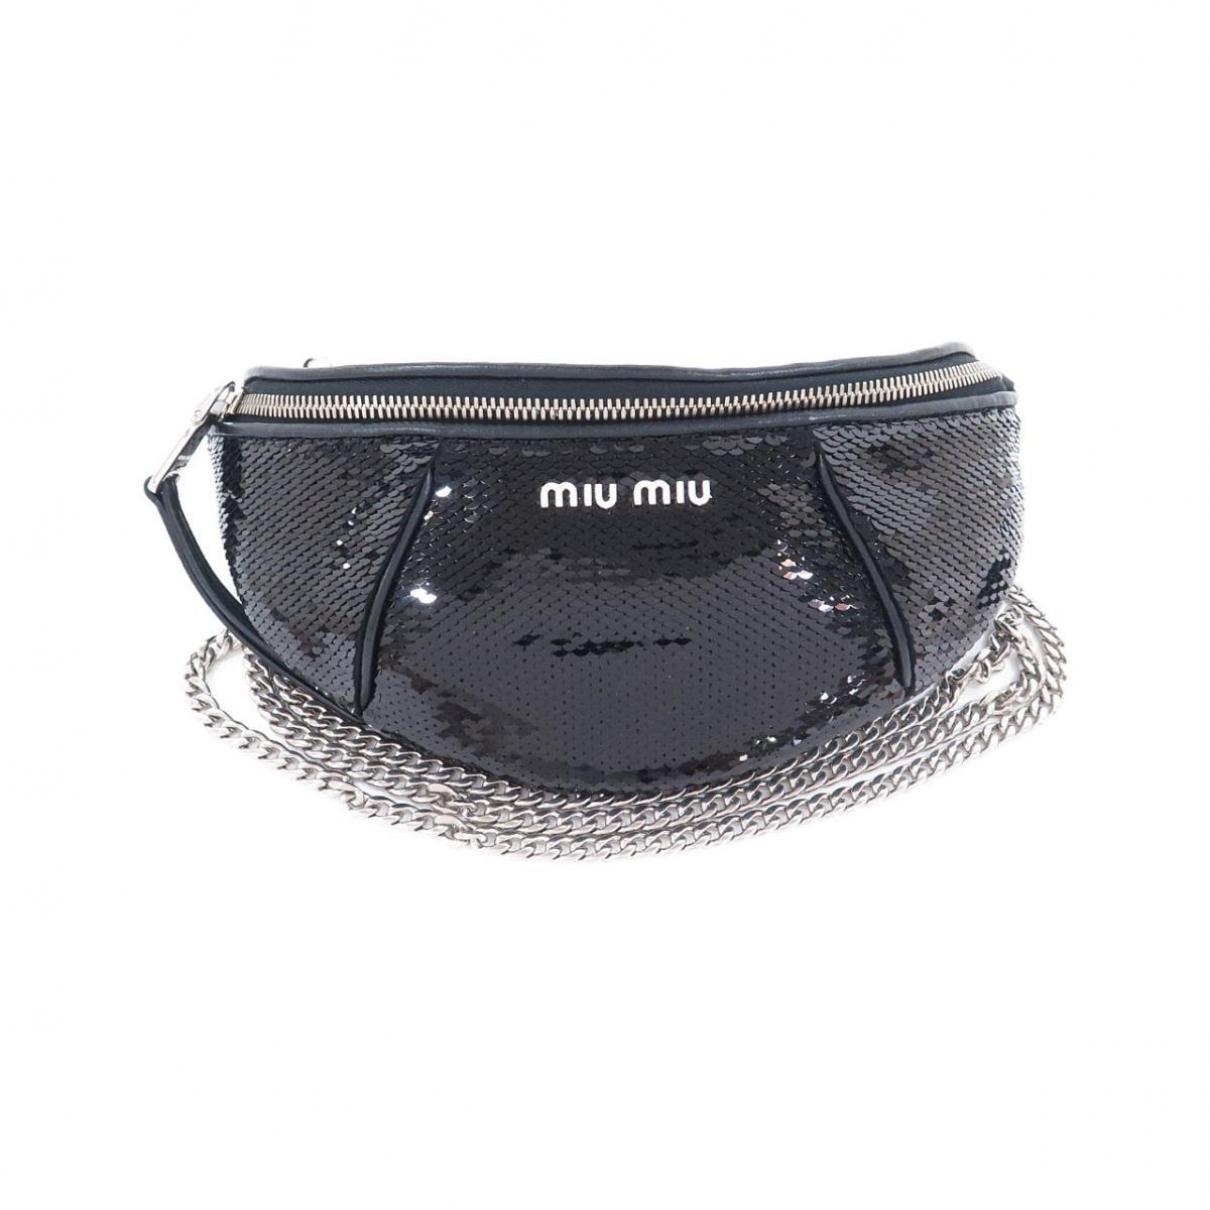 Miu Miu \N Black Glitter Clutch bag for Women \N